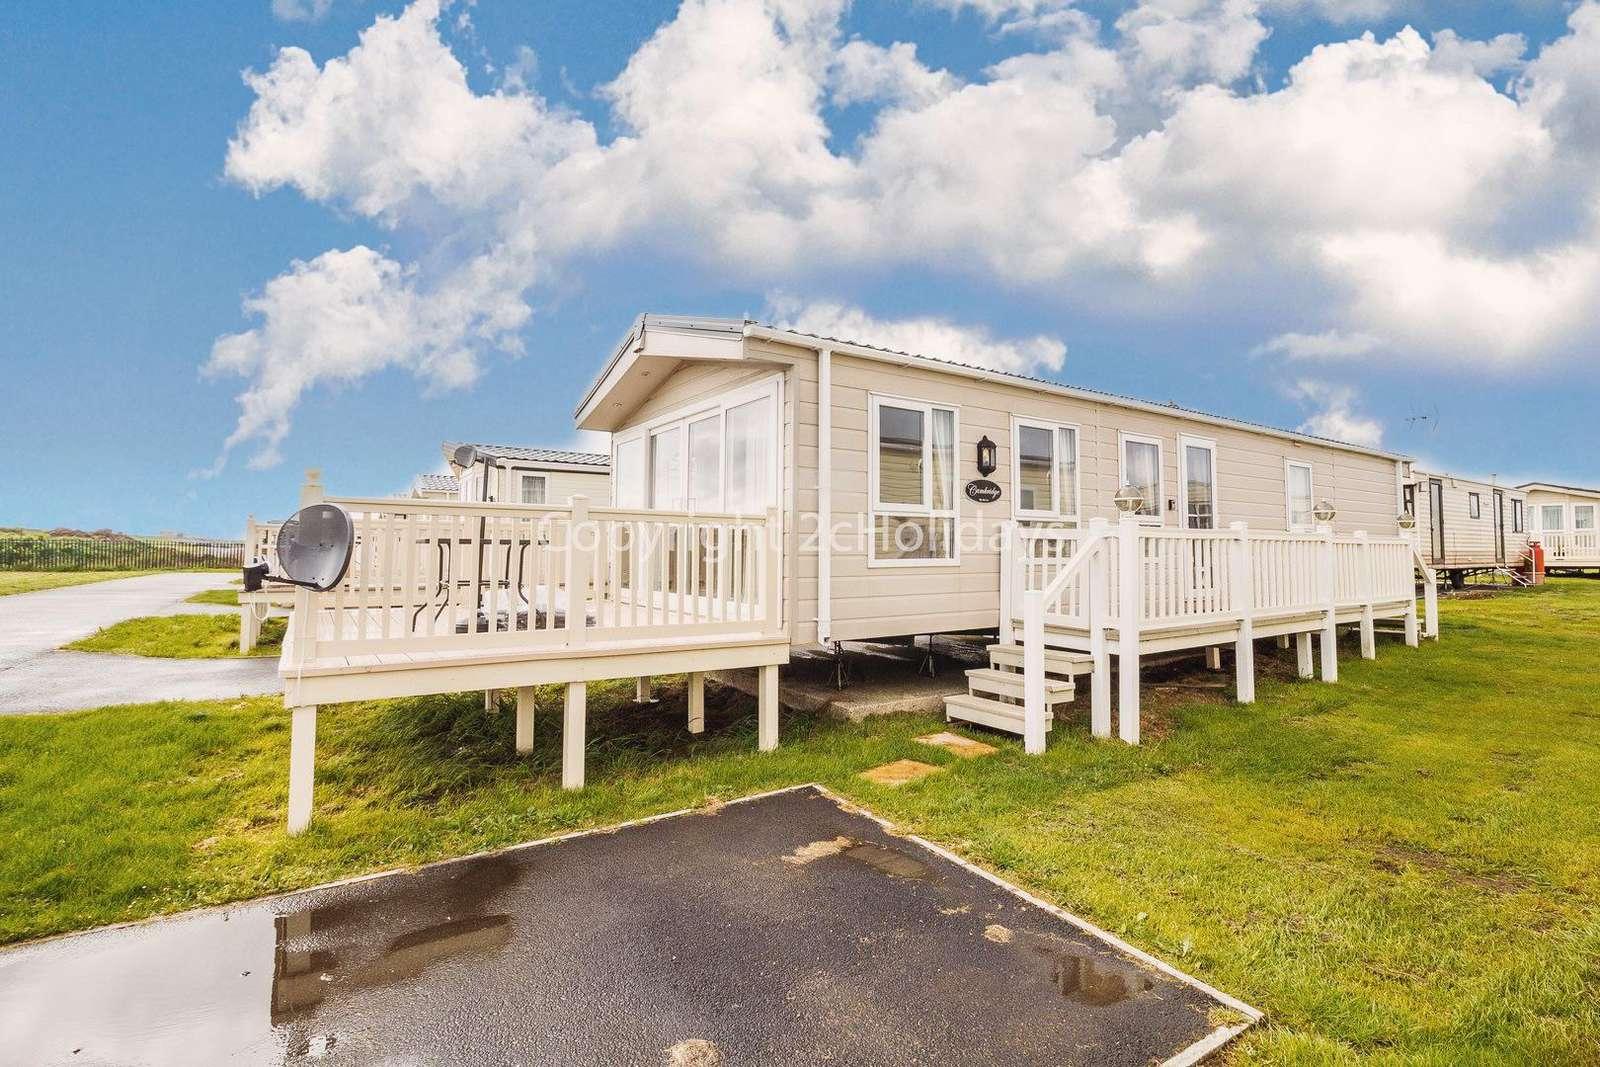 6 berth caravan with decking at St Osyth Beach Holiday Park.